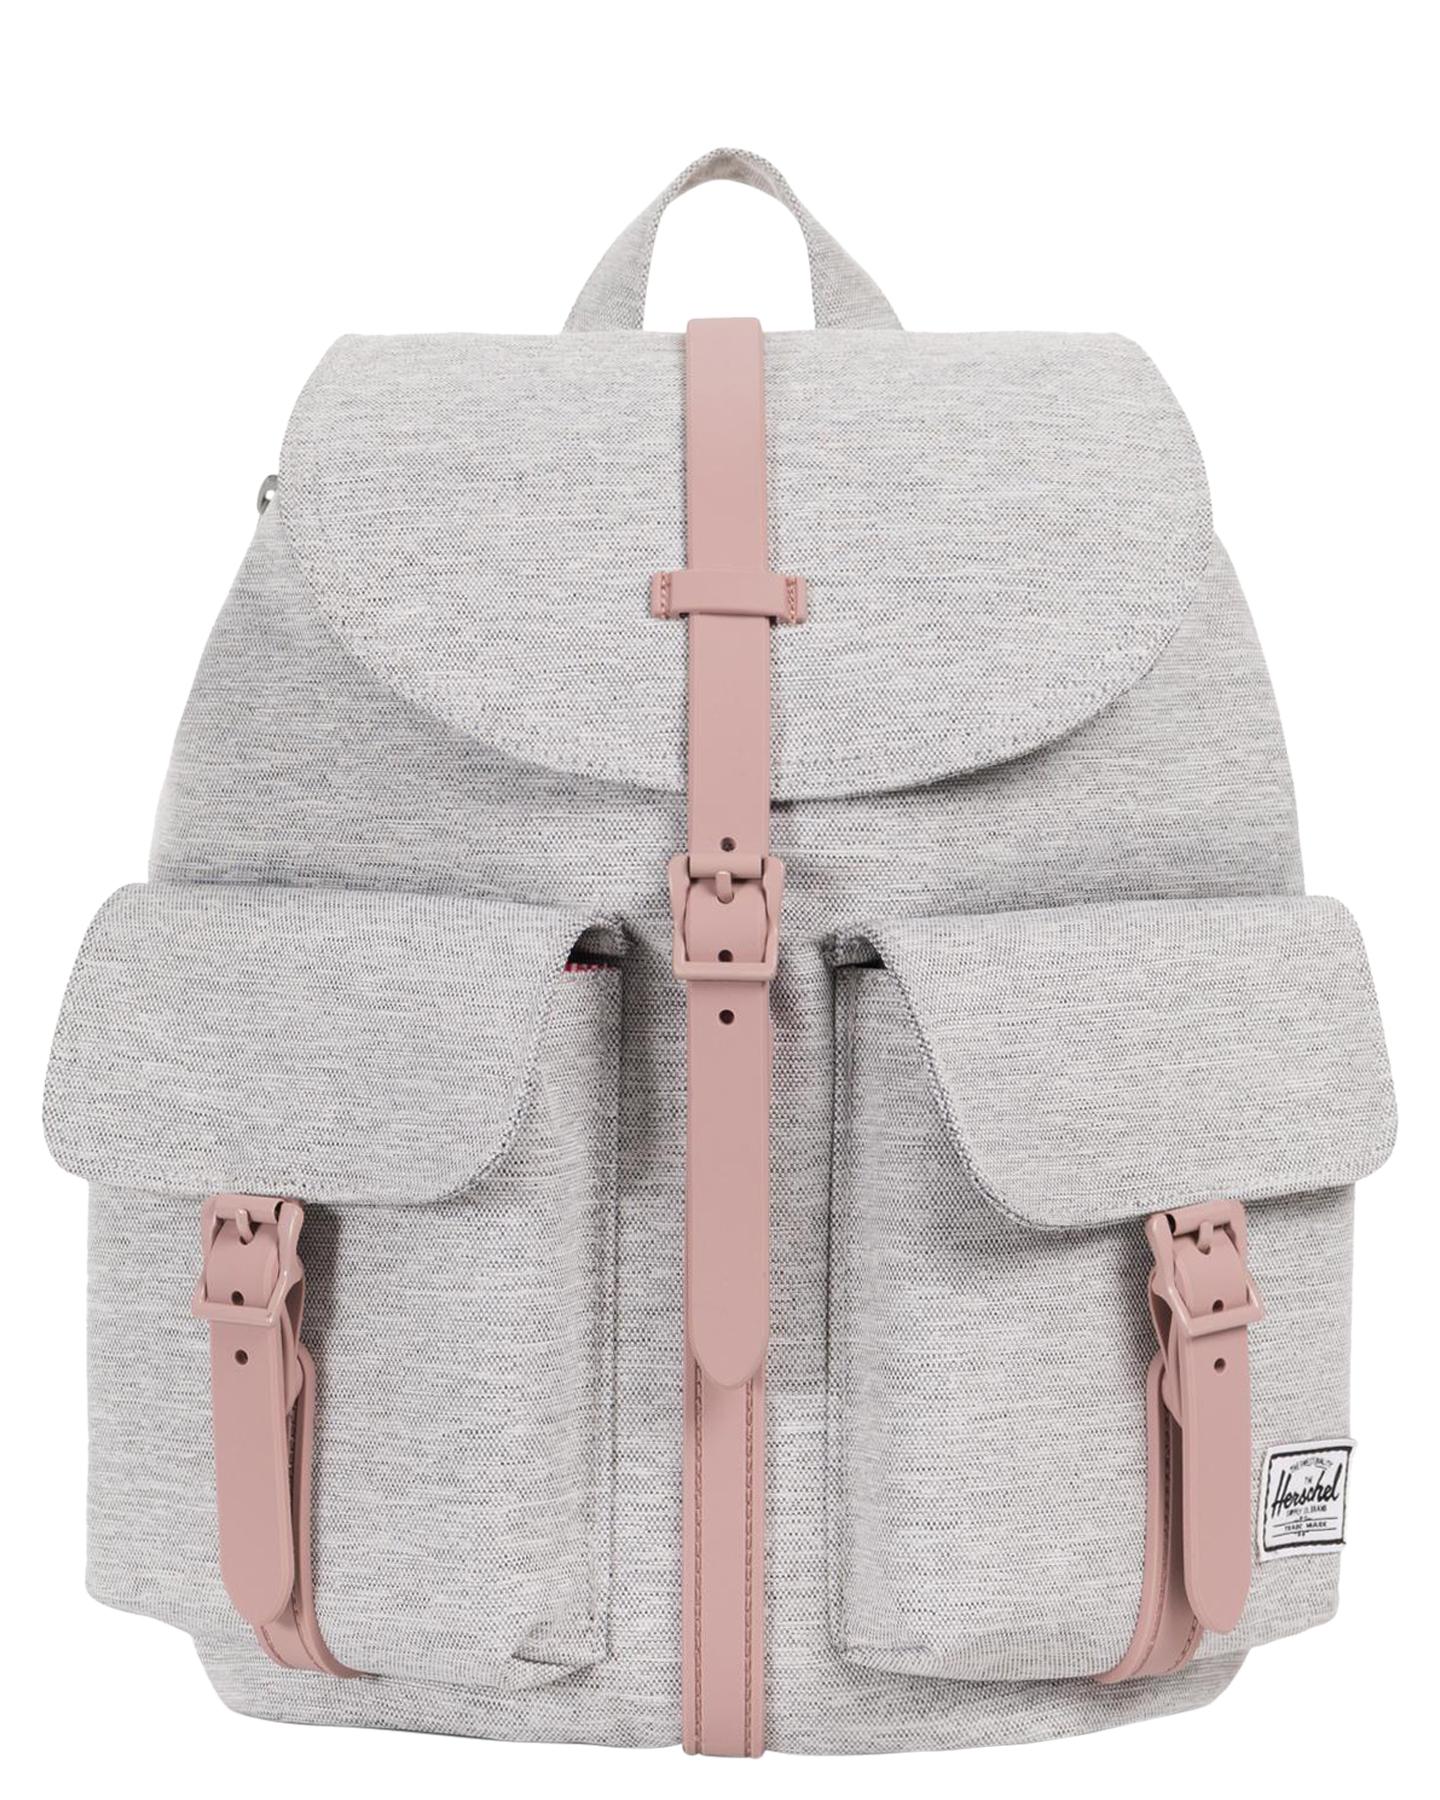 ee0241a175d Herschel Supply Co Dawson X Small Backpack - Light Grey Ash Rose ...